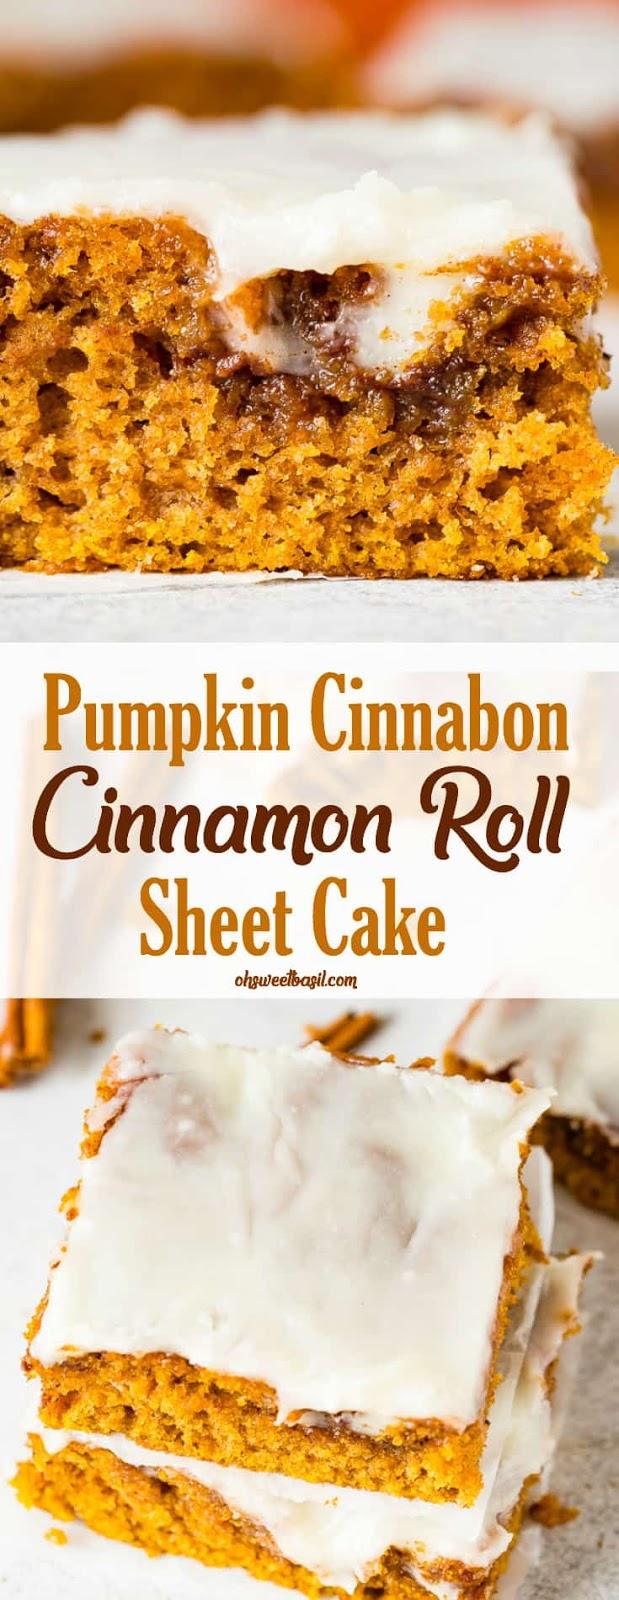 PUMPKIN CINNABON CINNAMON ROLL SHEET CAKE